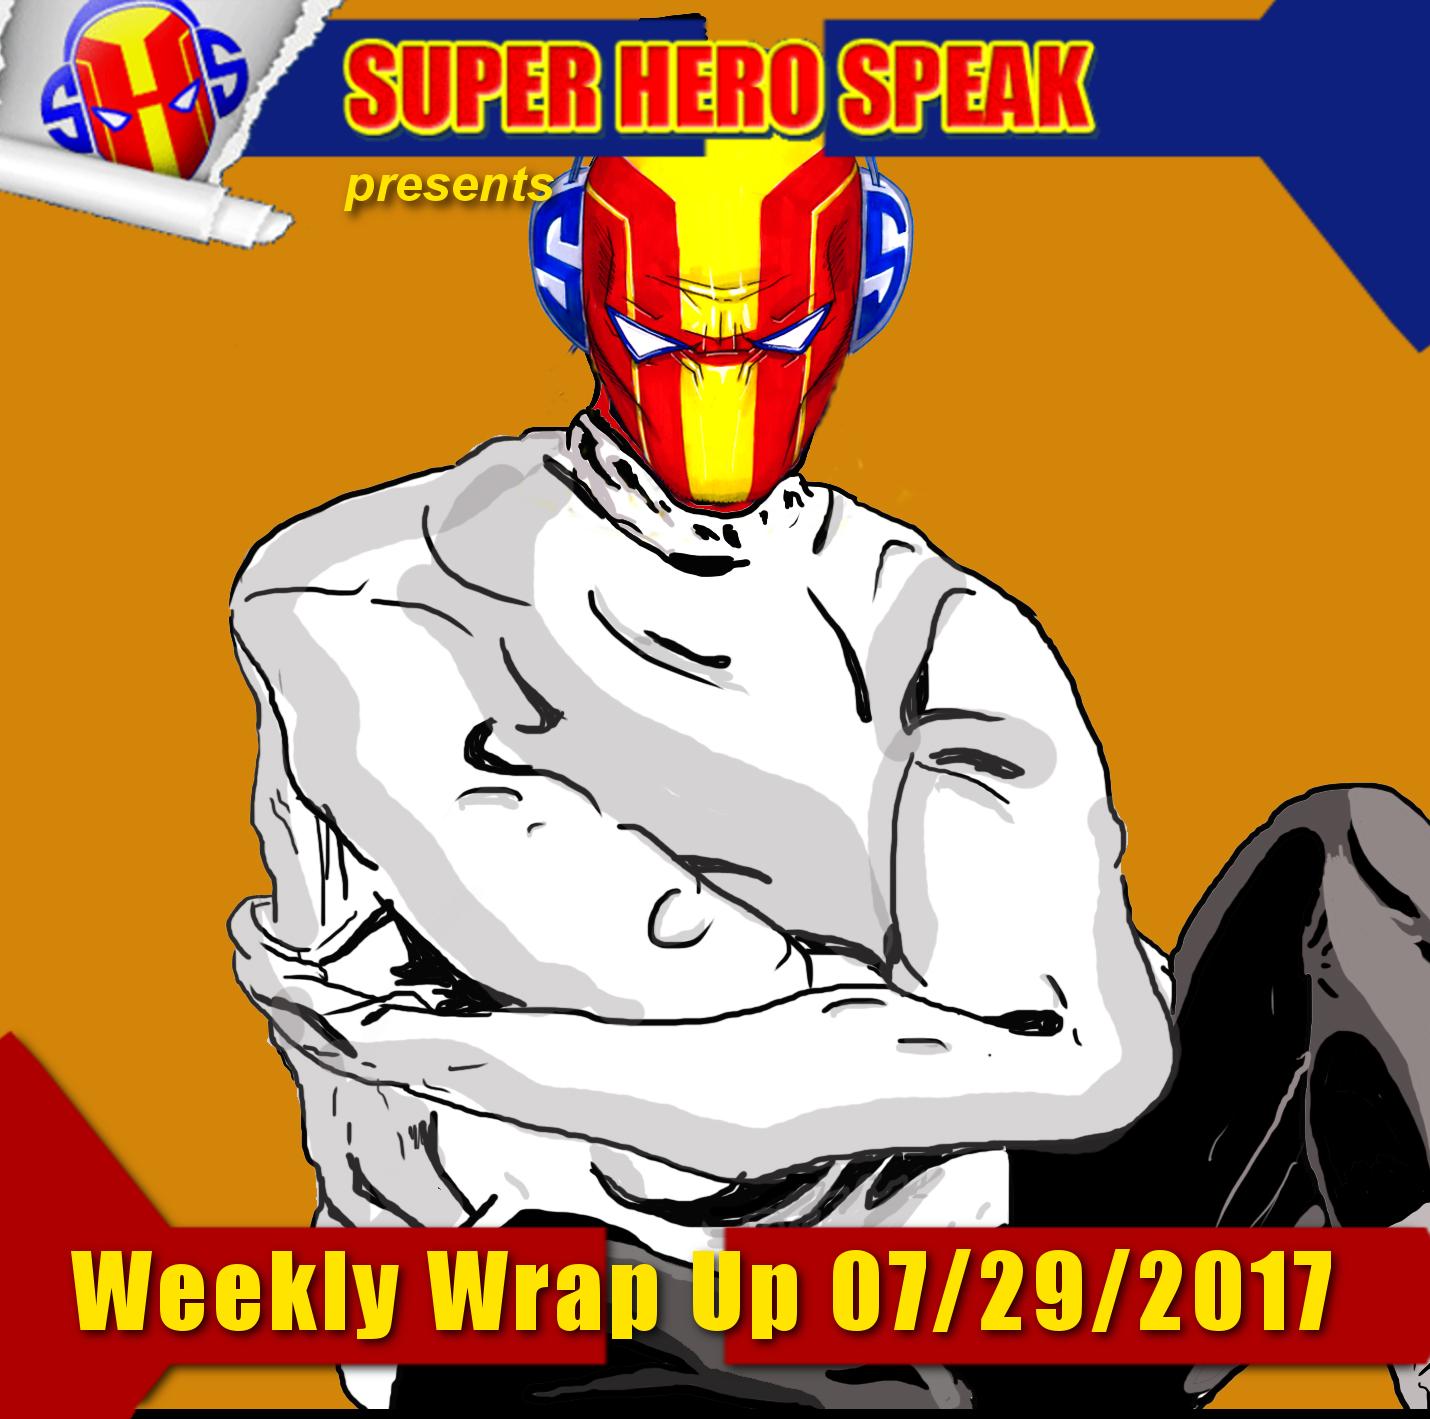 SHS Weekly Wrap Up 07/29/2017